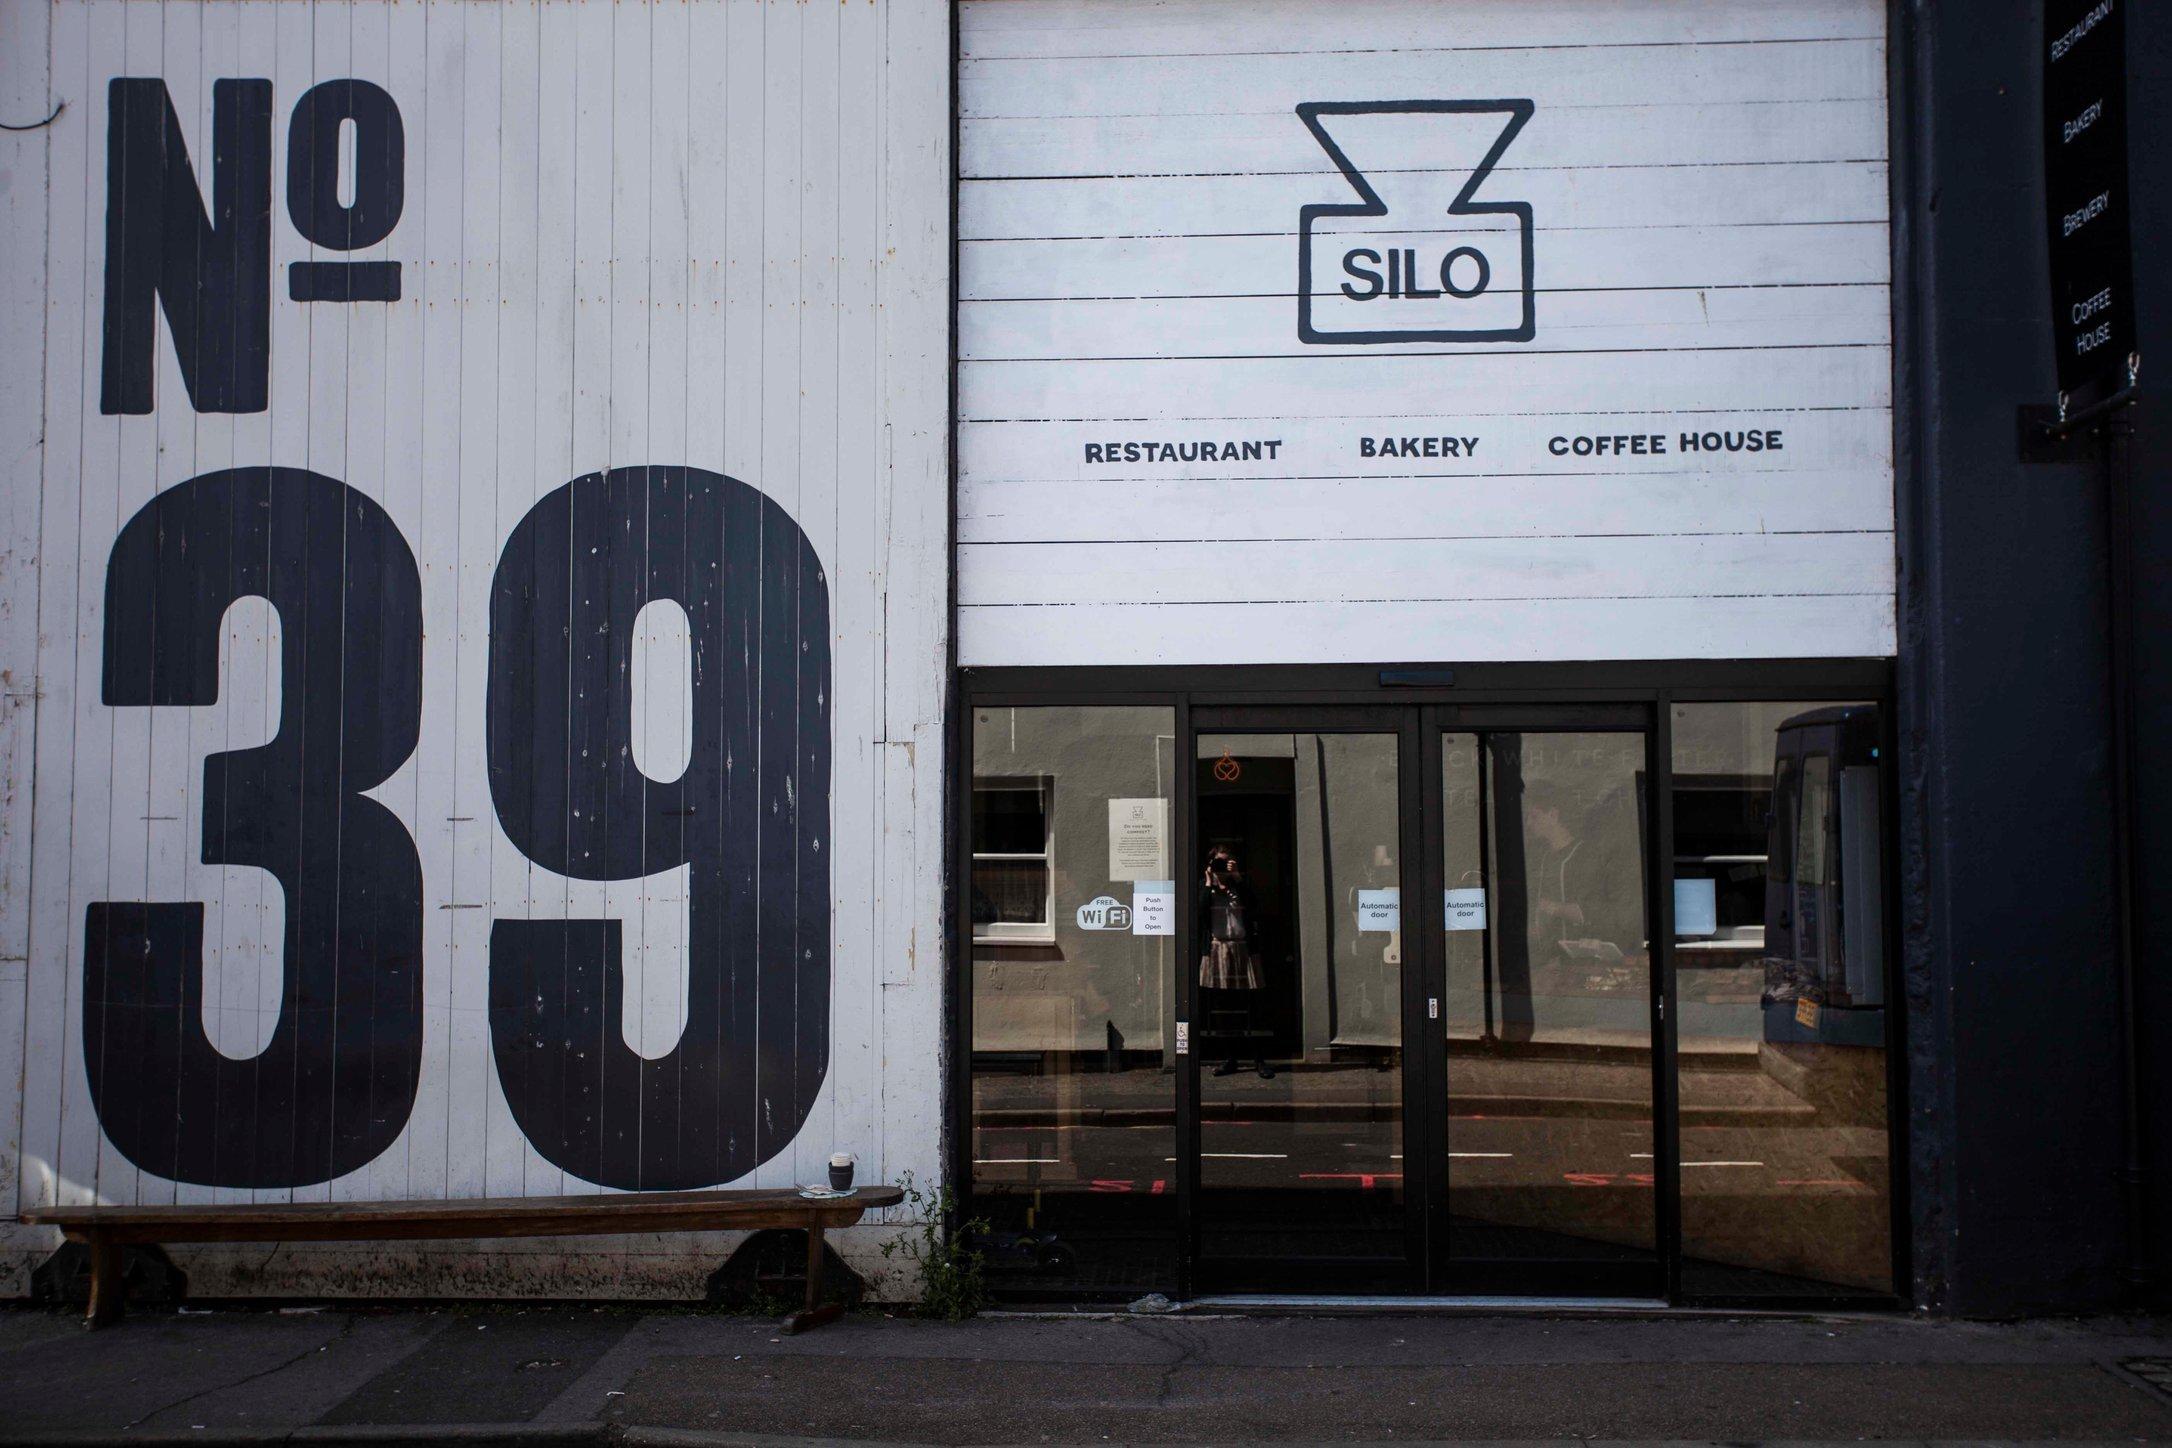 Silo_253.jpg